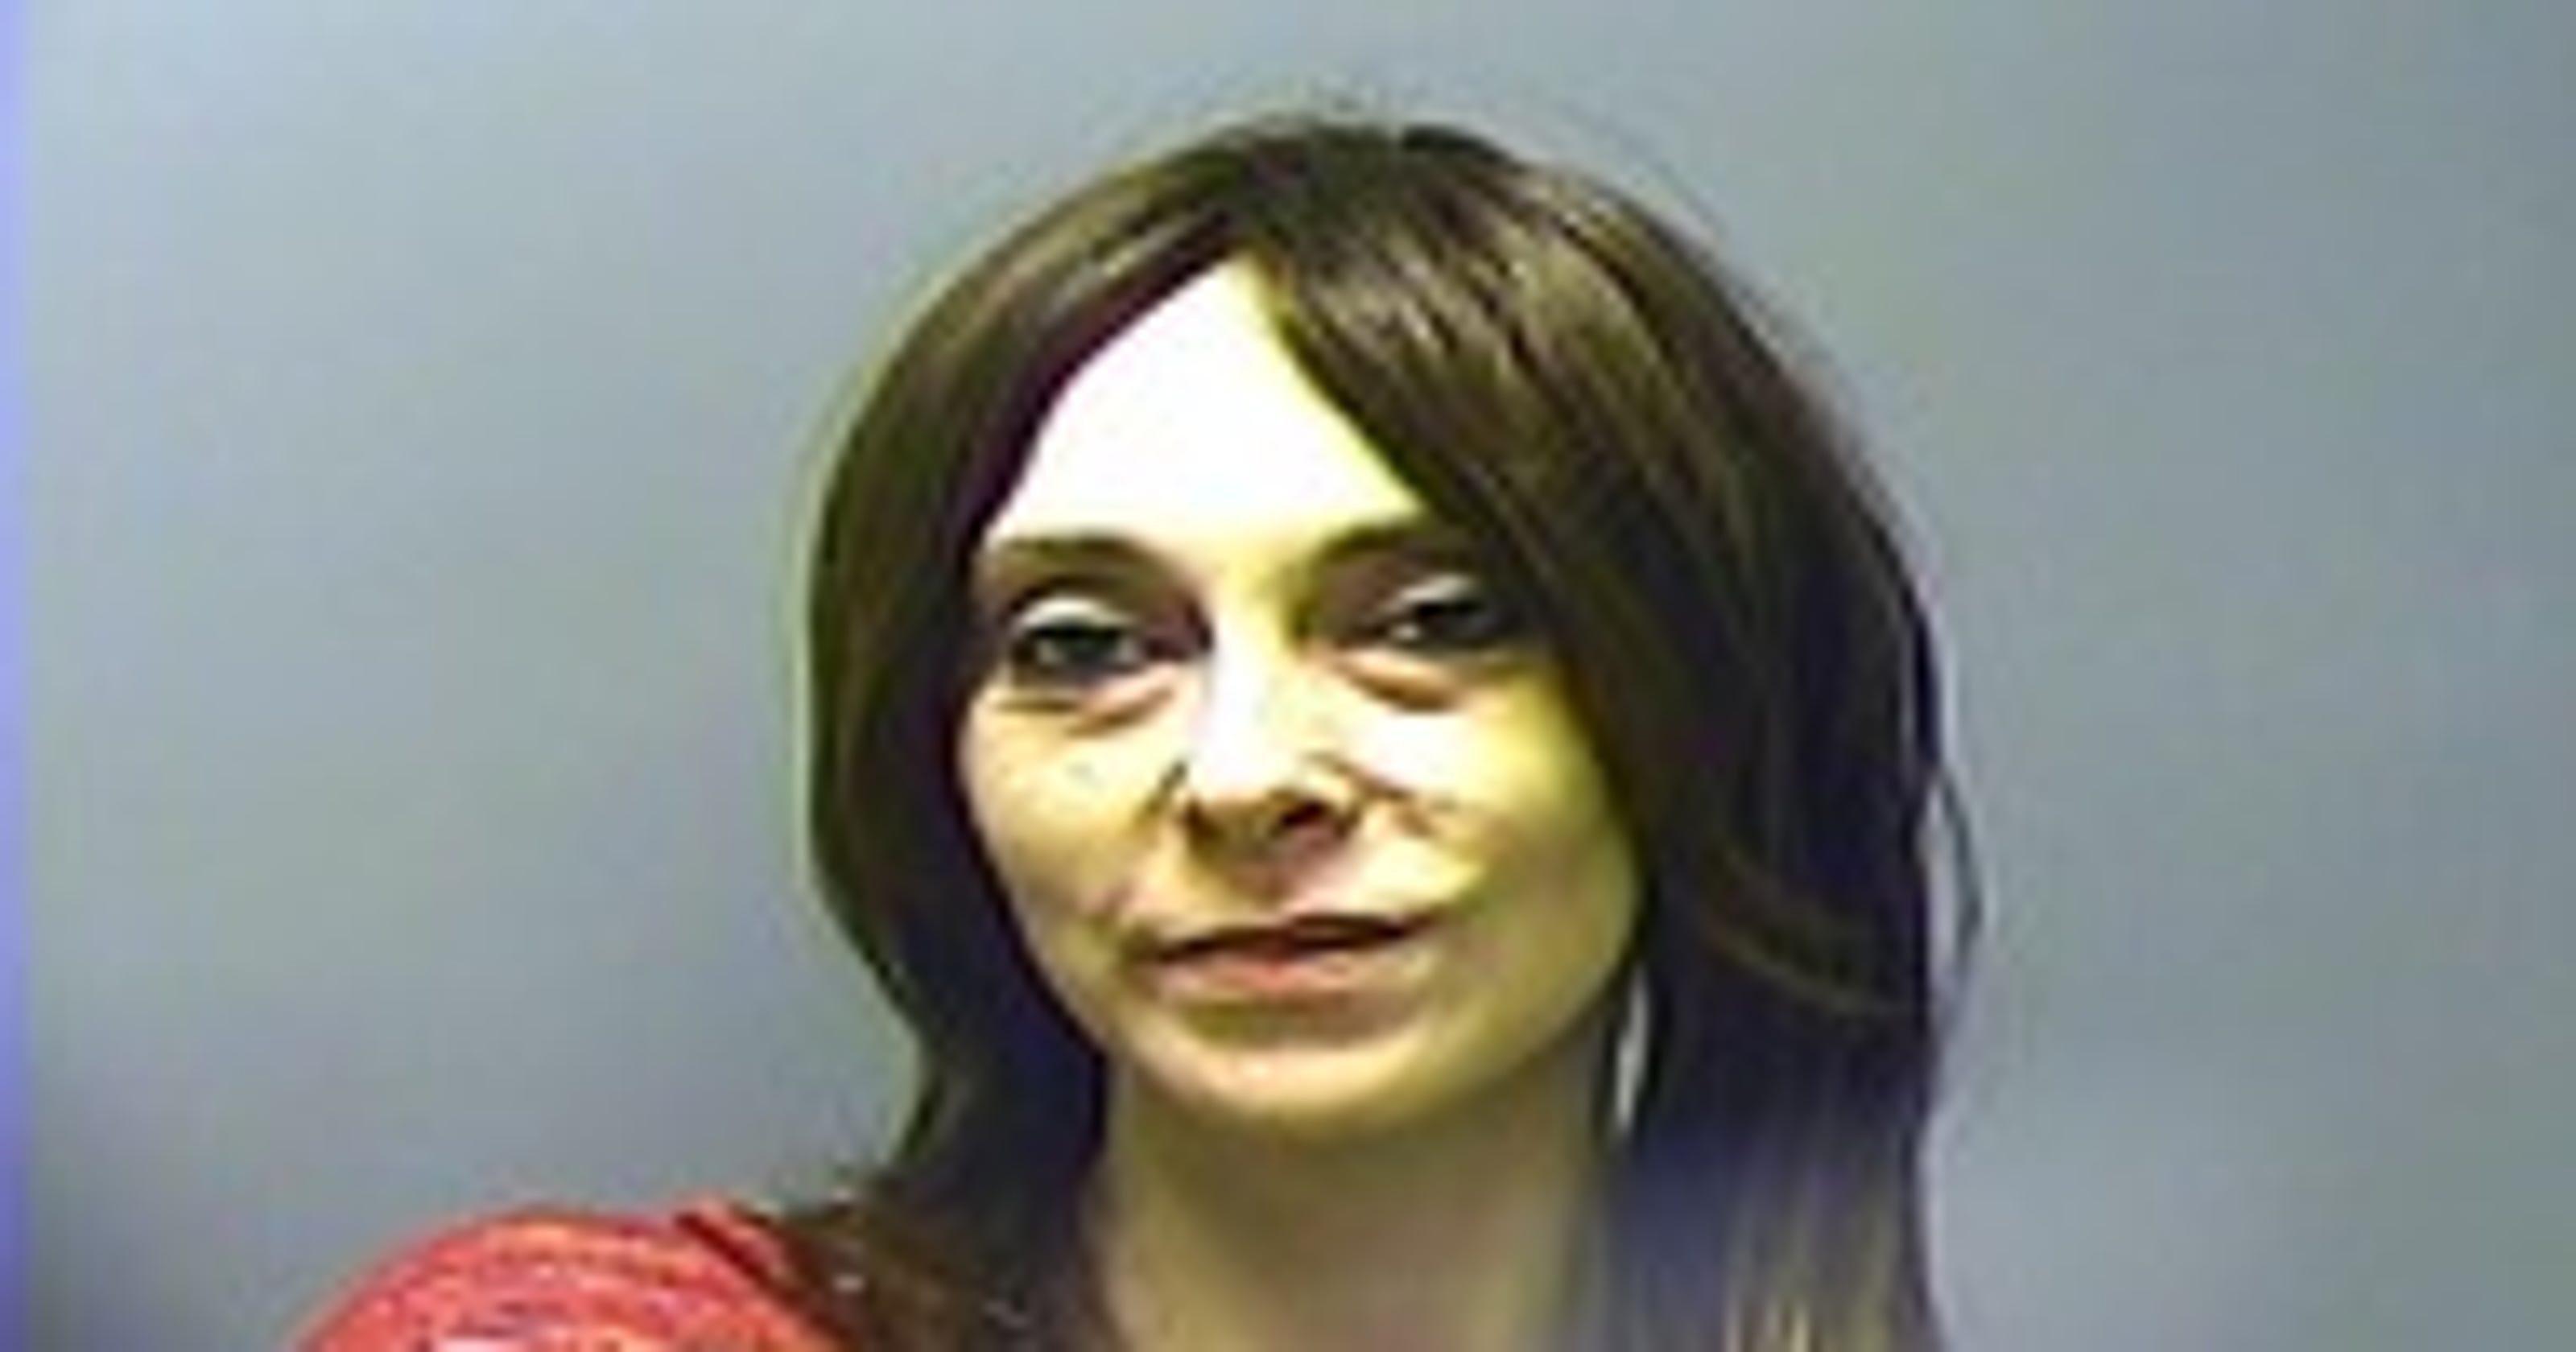 Munchies lead to drug arrest